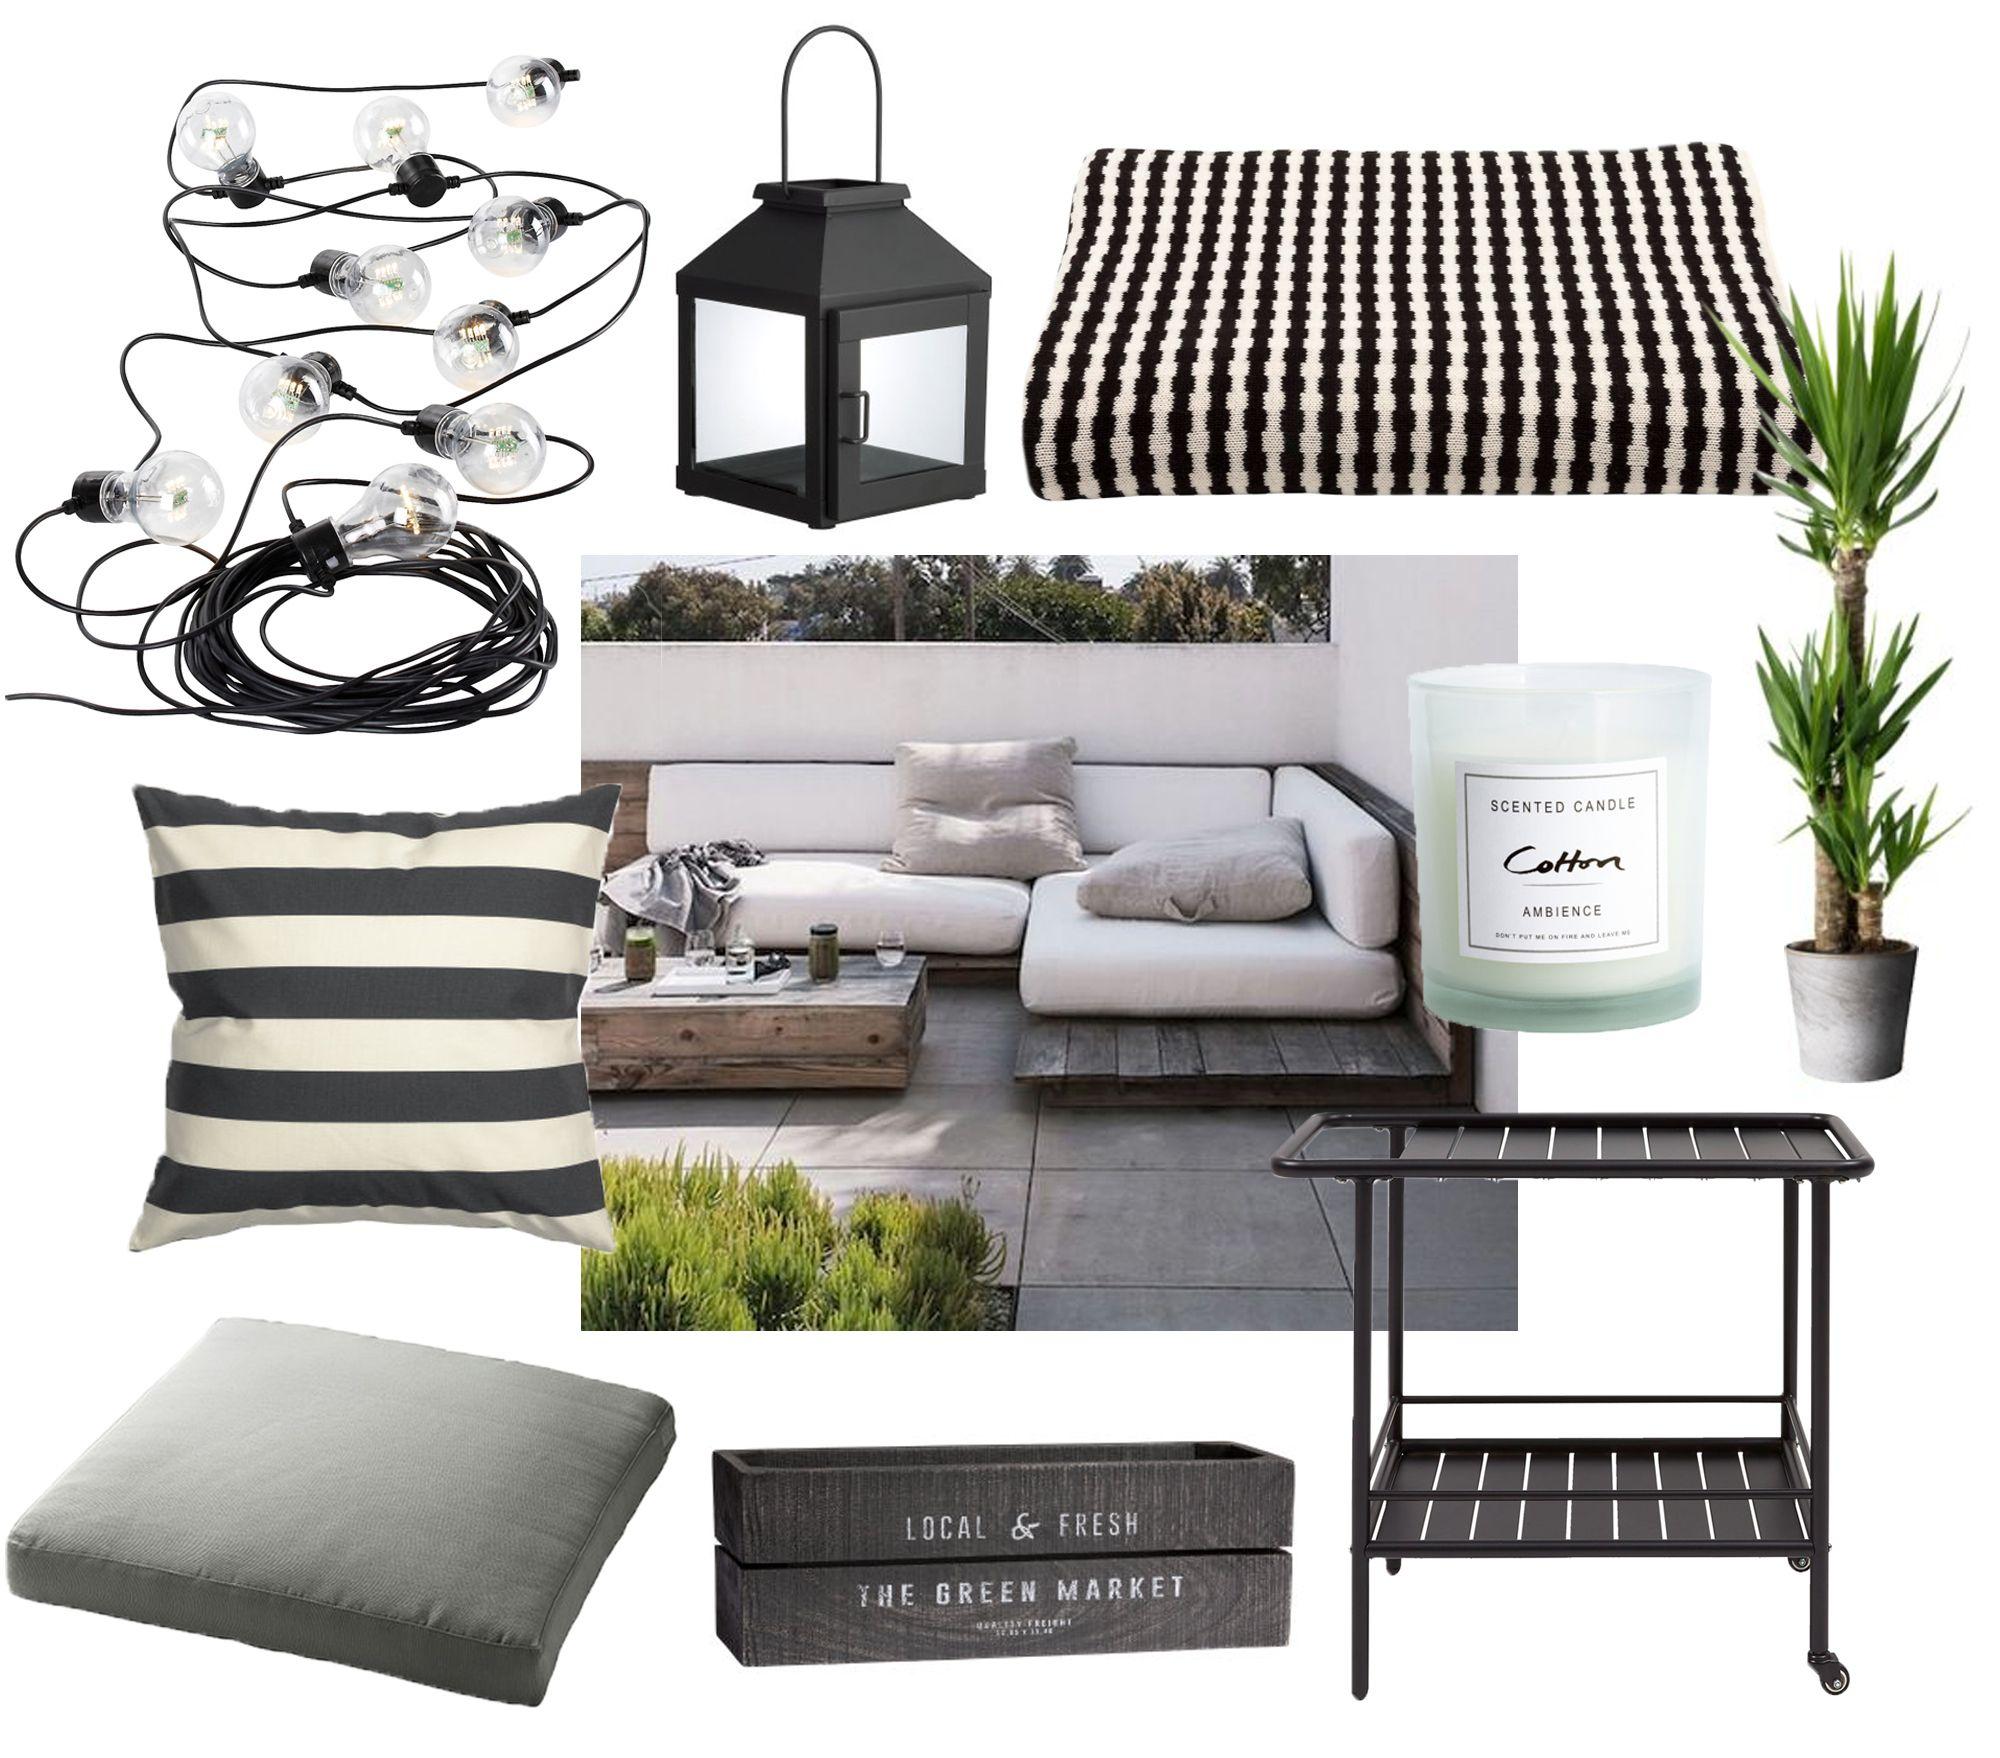 Outdoor interior – lounge area.